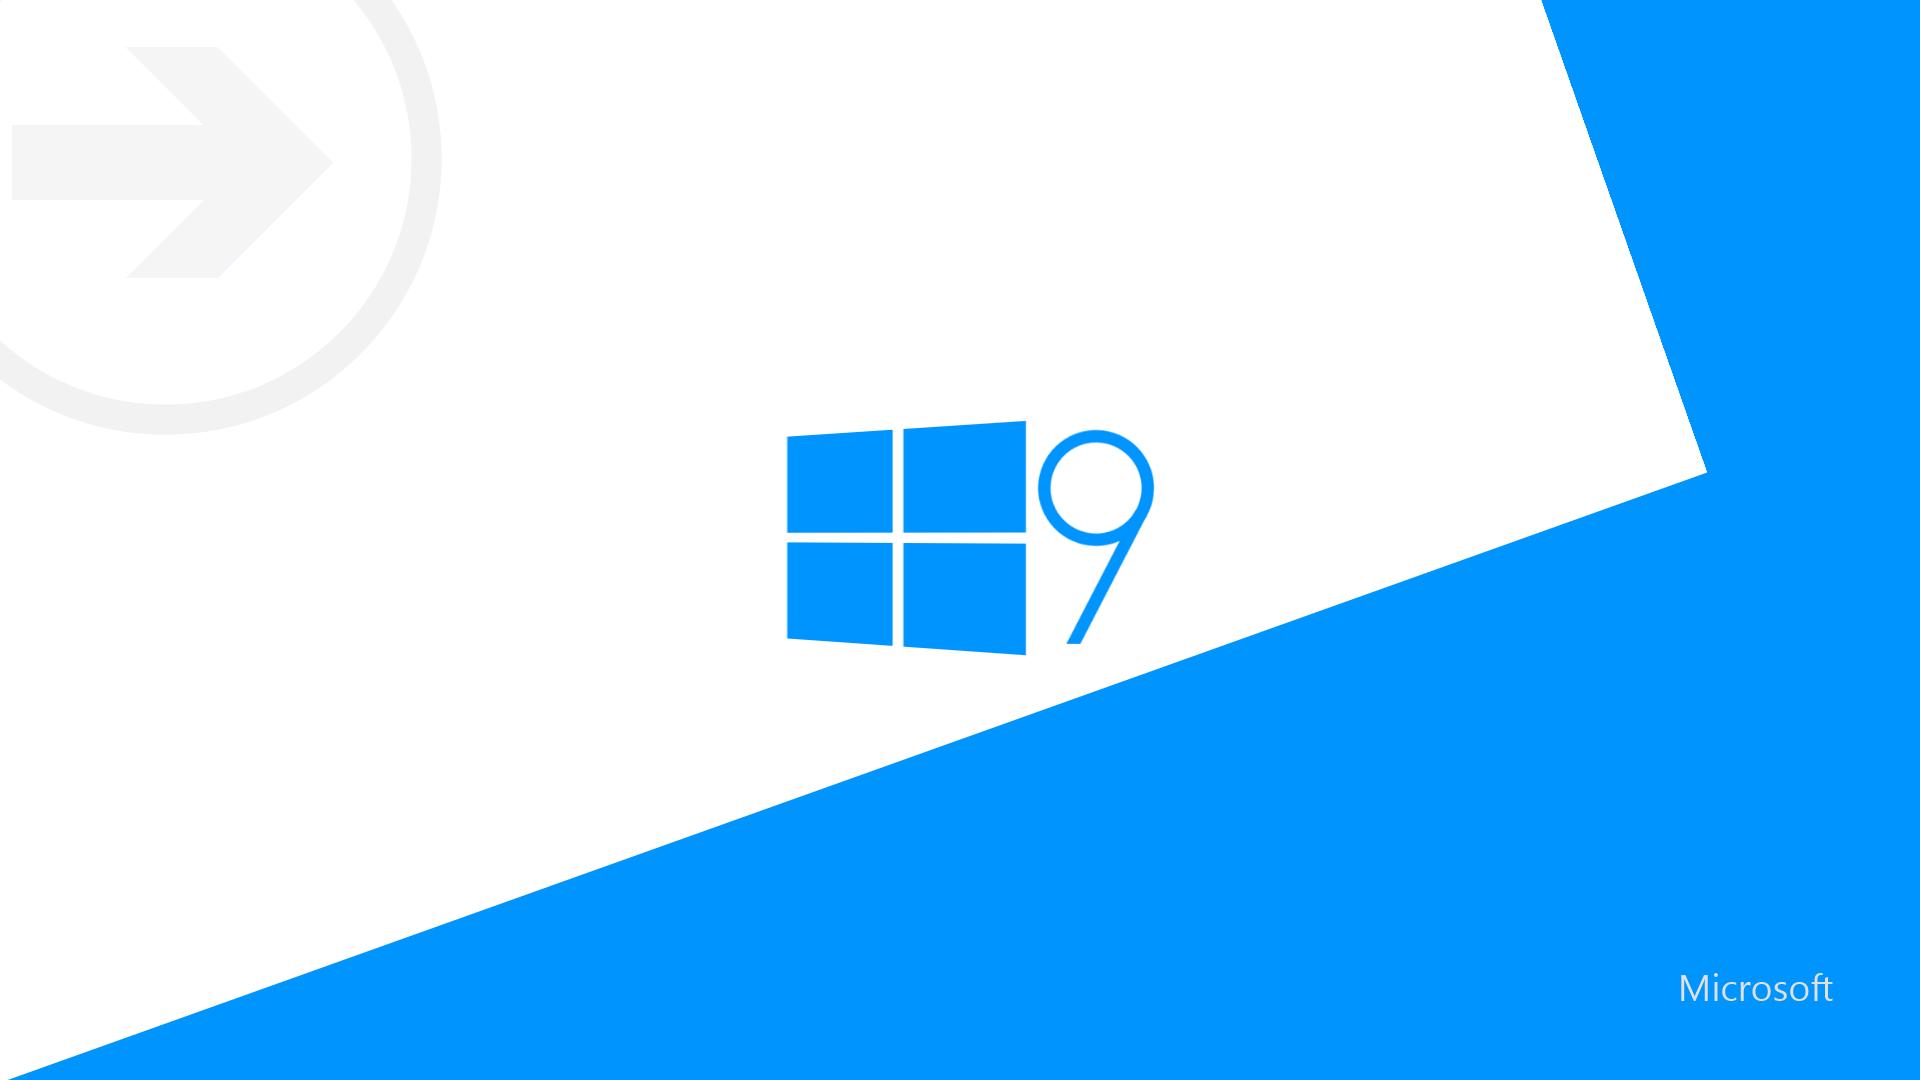 Windows 9, στο δεύτερο τρίμηνο του 2015 η πιθανή κυκλοφορία